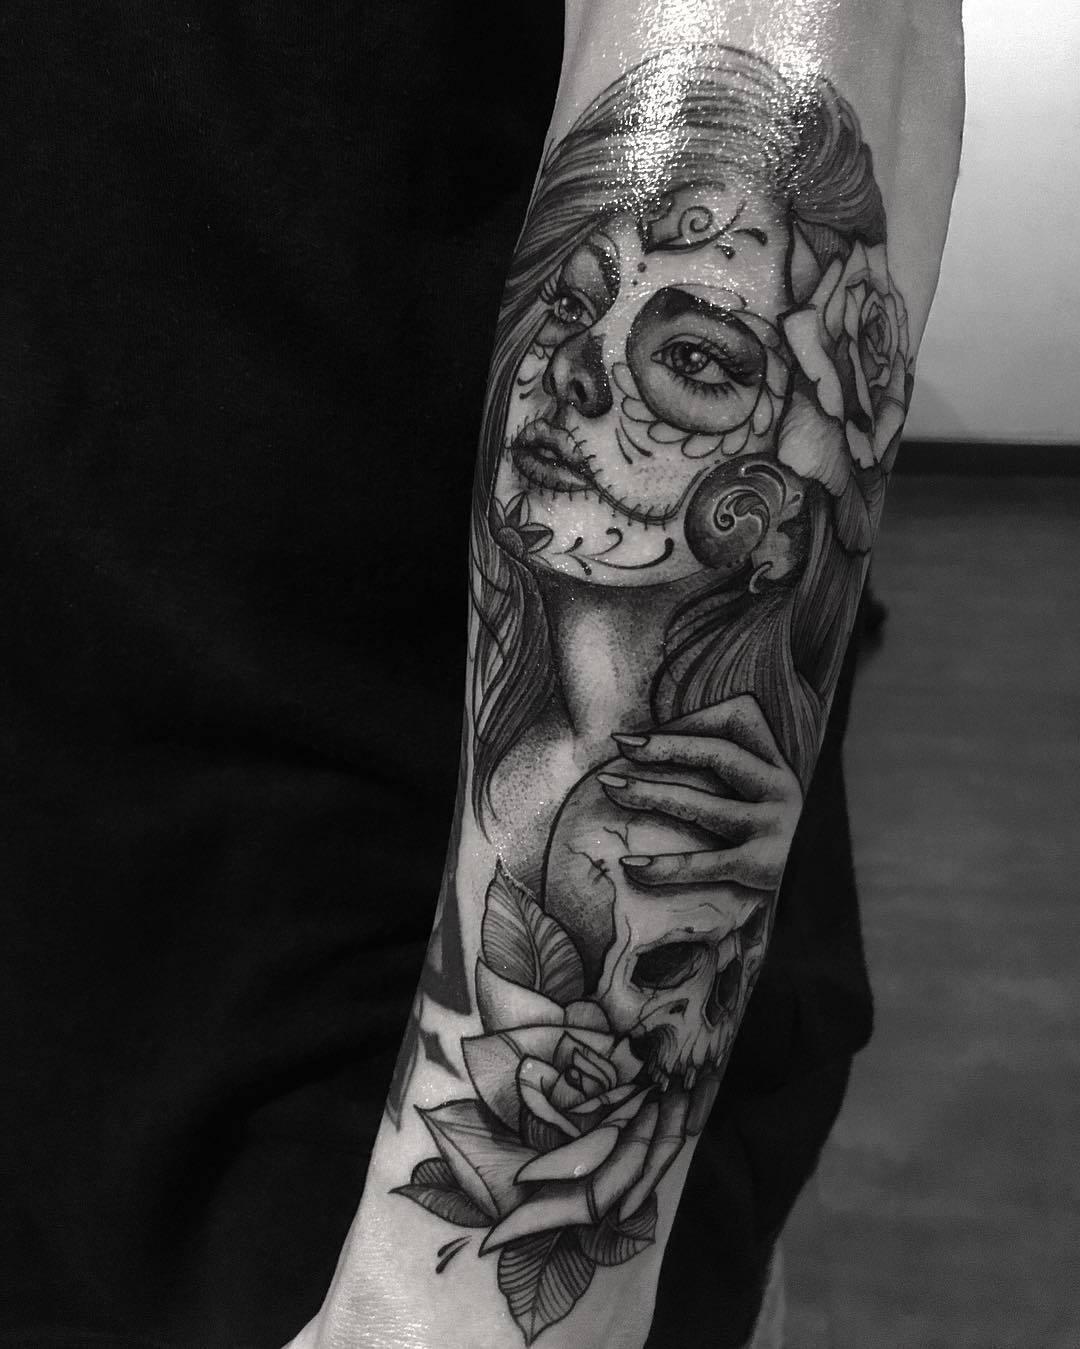 Geschichte hinter dem Trend - La Catrina Tattoo